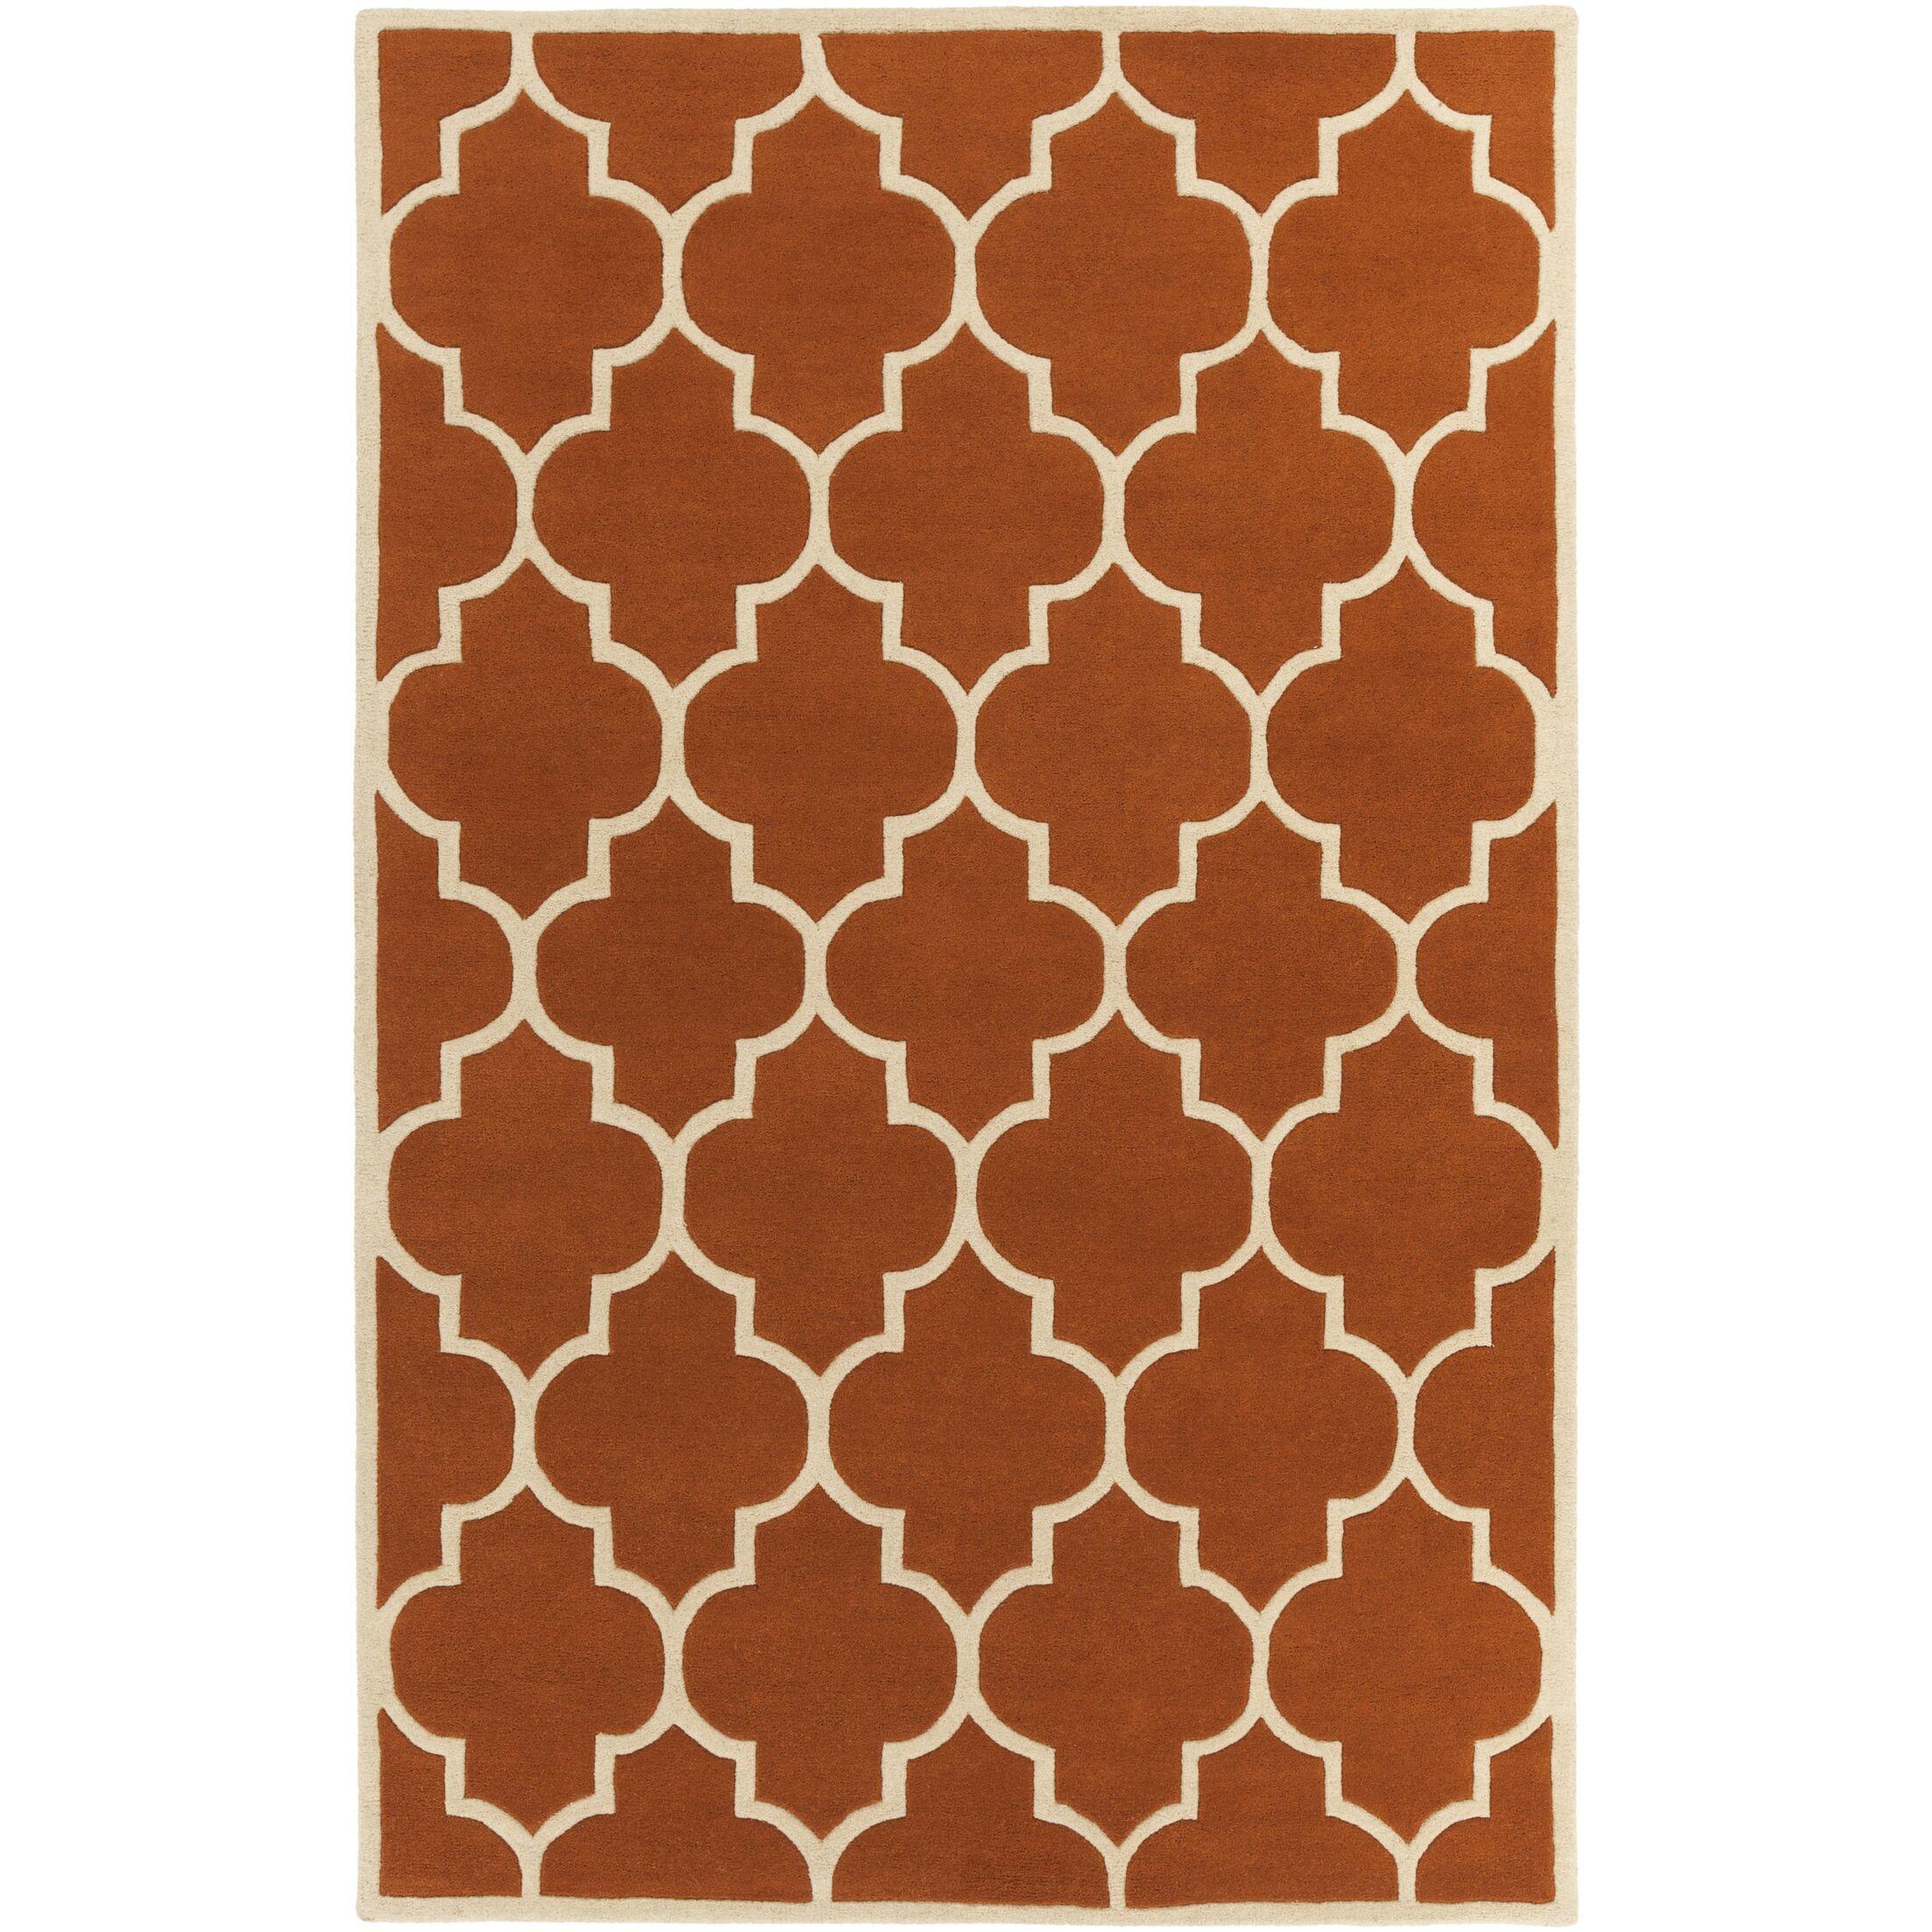 Ayler Orange Geometric Area Rug Rug Size: Rectangle 5' x 8'